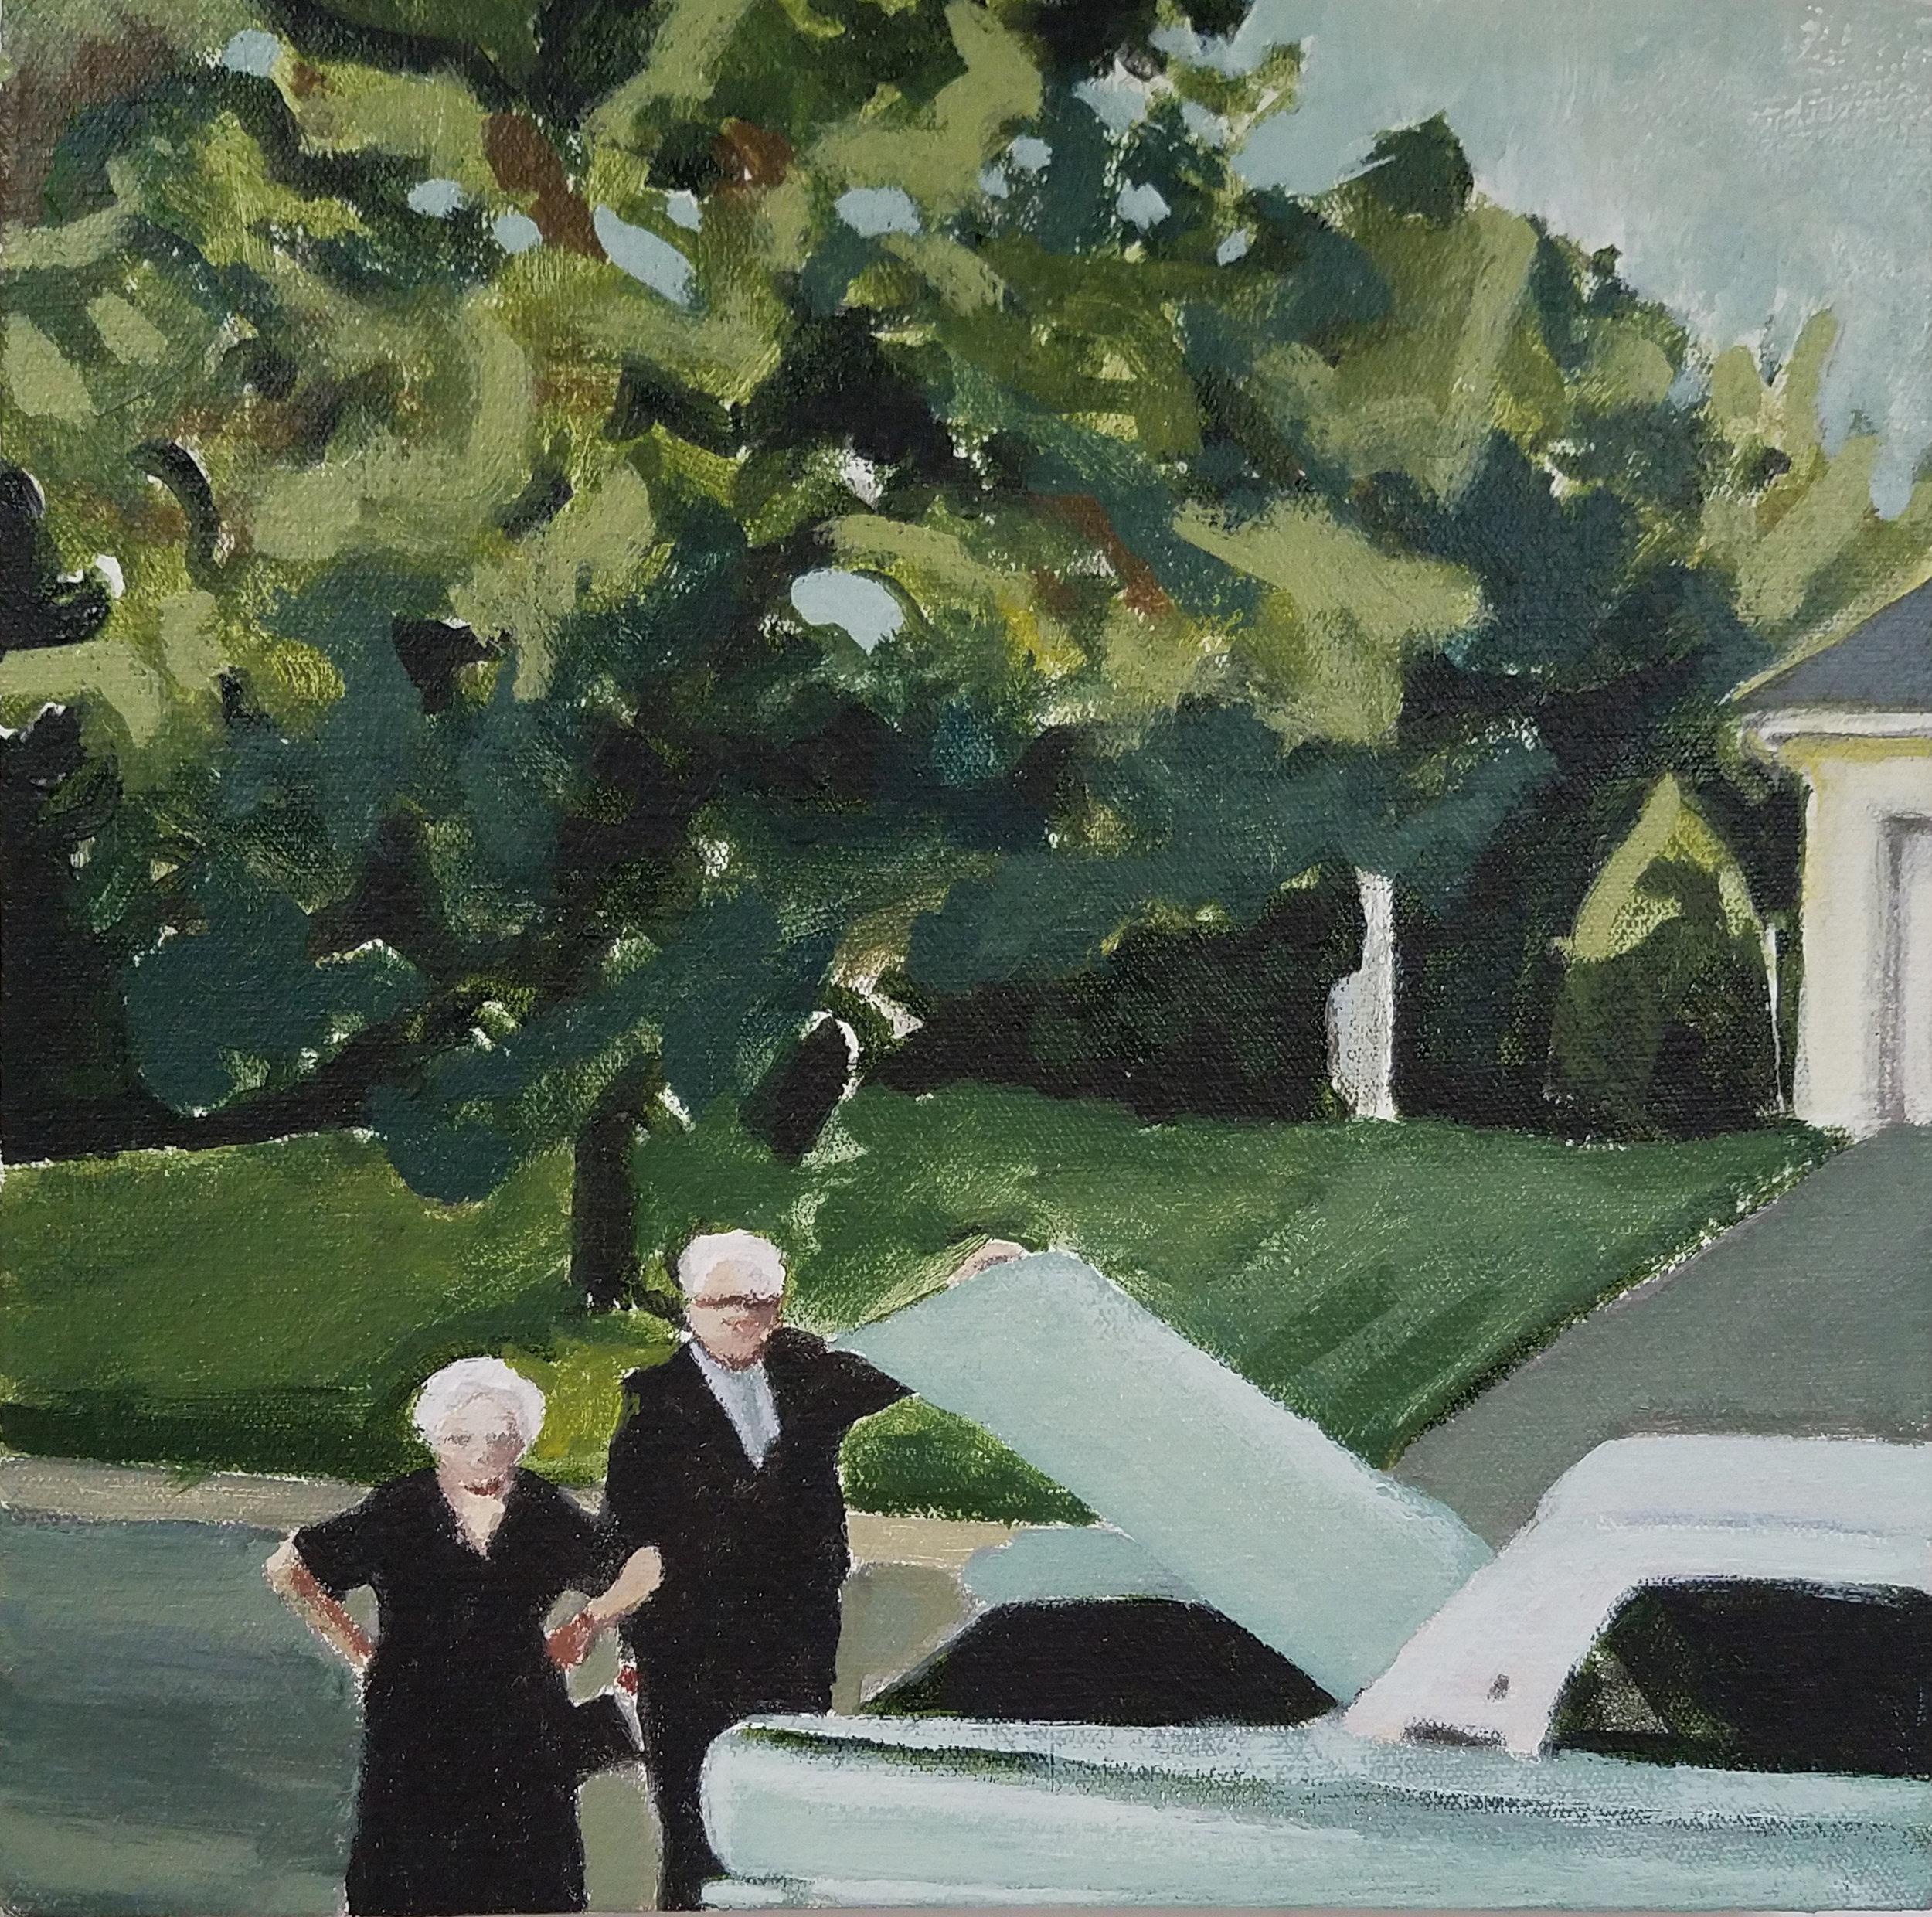 "(Untitled), acrylic on canvas, 12"" x 12"", 2017"